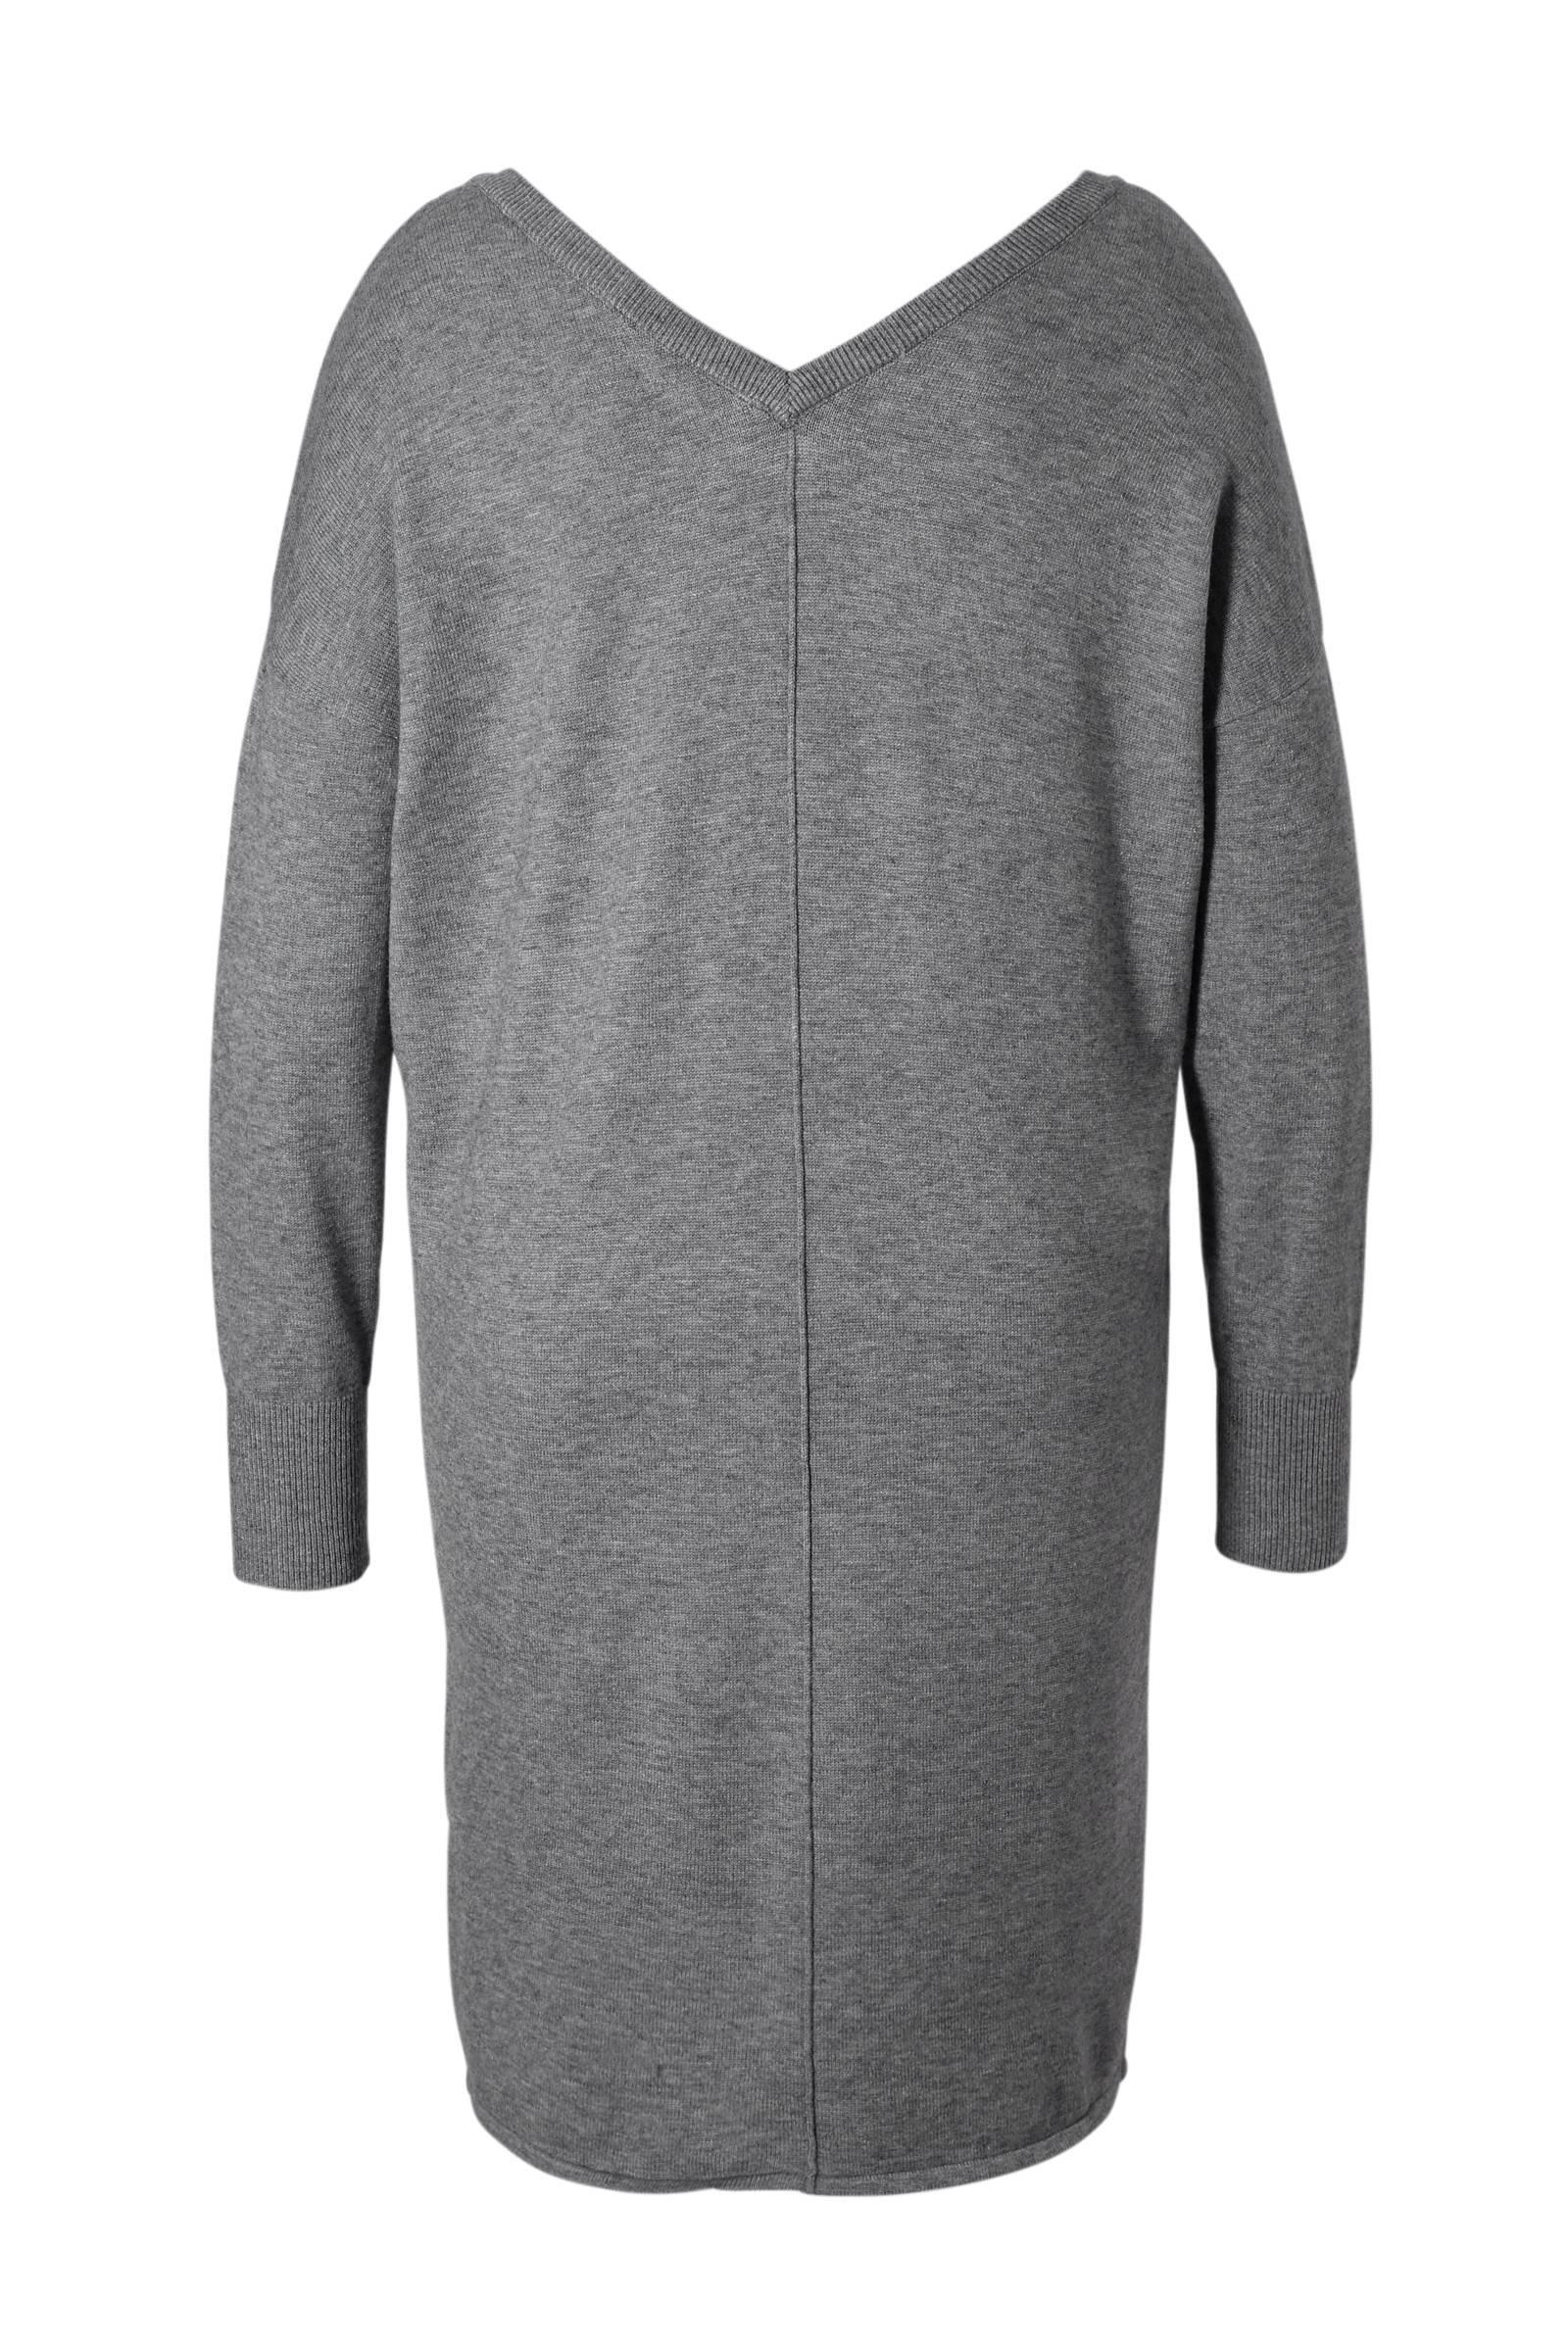 Lange Sweater Trui.Whkmp S Great Looks Lange Trui Wehkamp